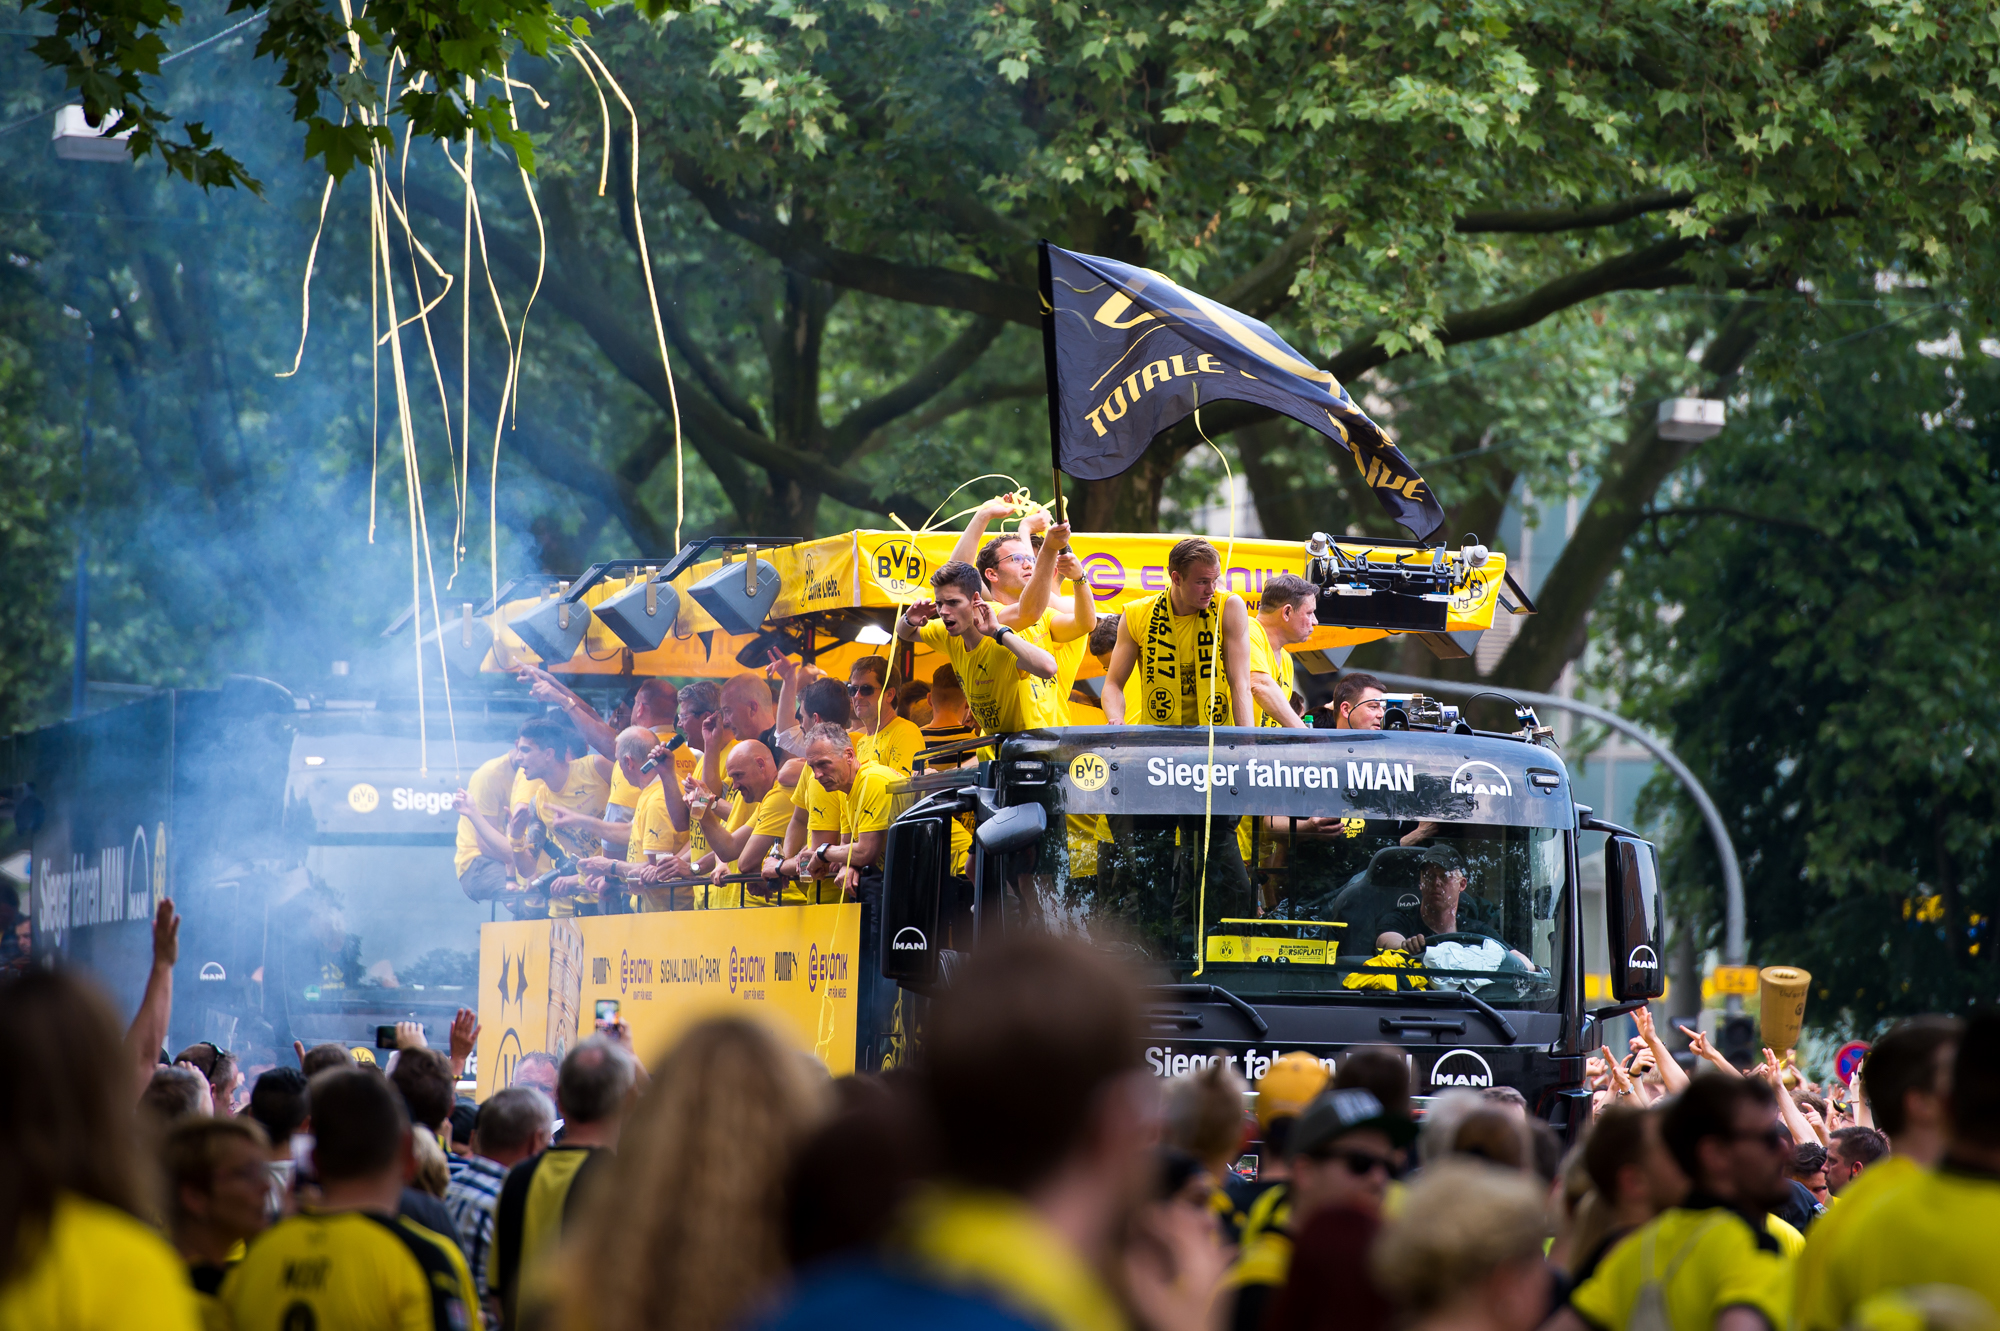 2016–17 Borussia Dortmund season - Wikipedia